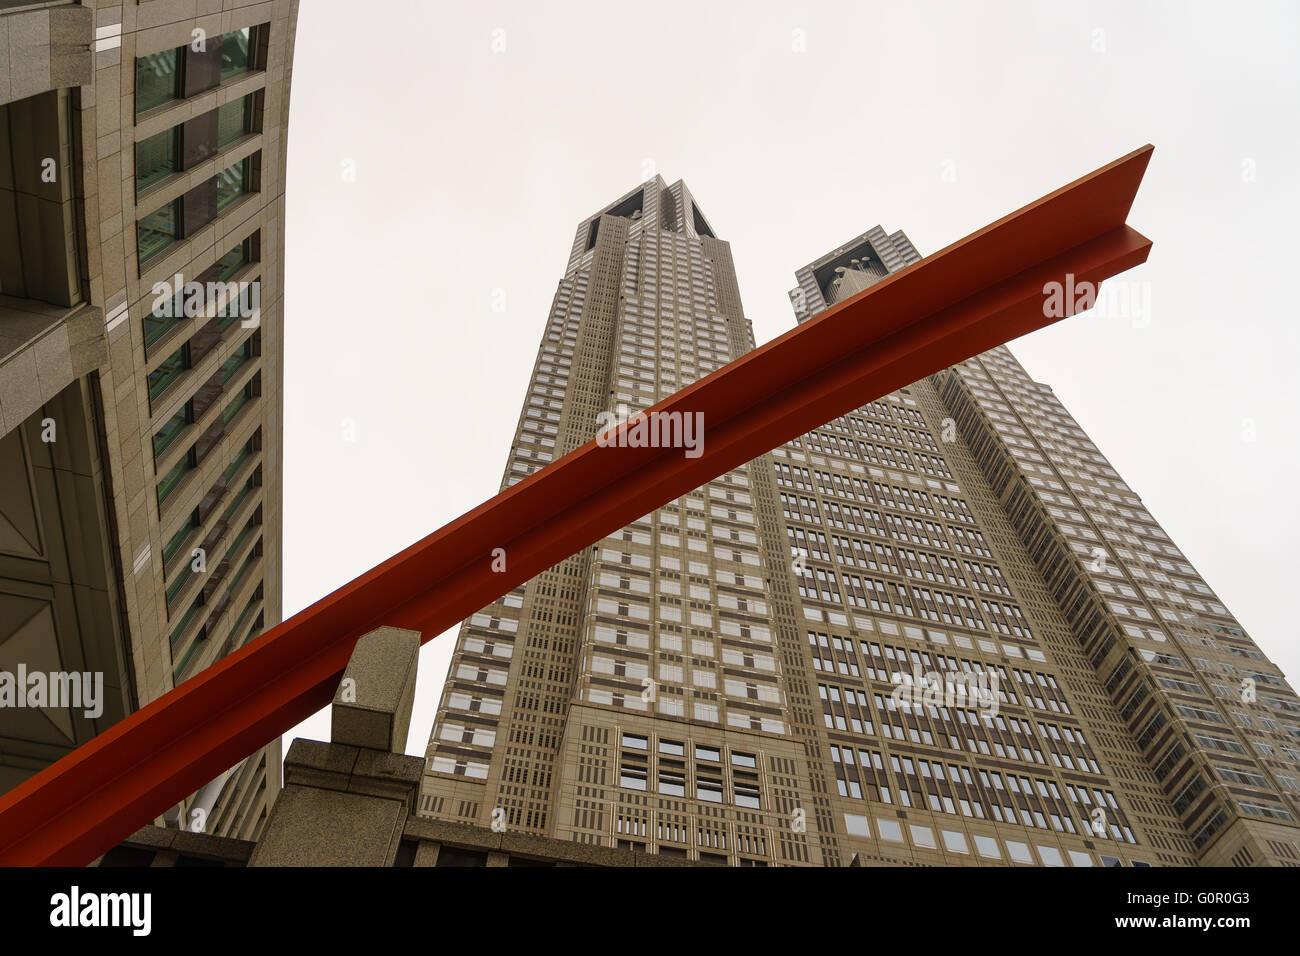 Tokyo Metropolitan Government Building, Shinjuku, Tokyo, Japan. - Stock Image